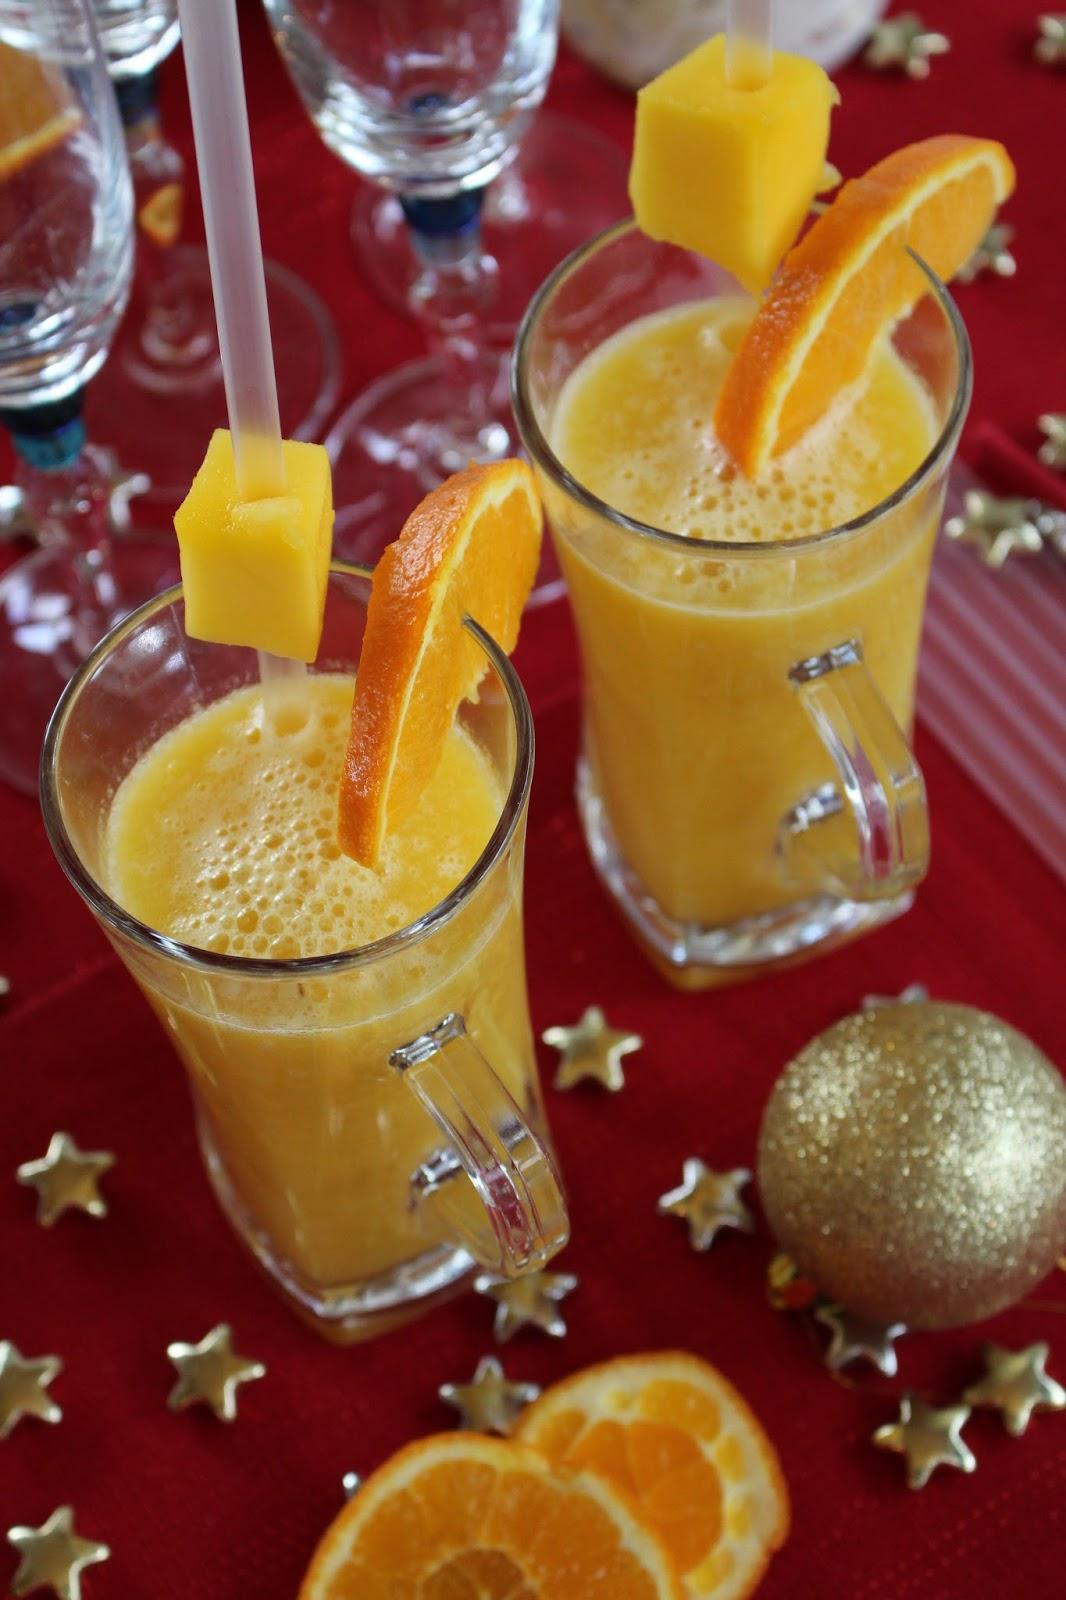 Mango-Maracuja-Smoothie von Sugarprincess